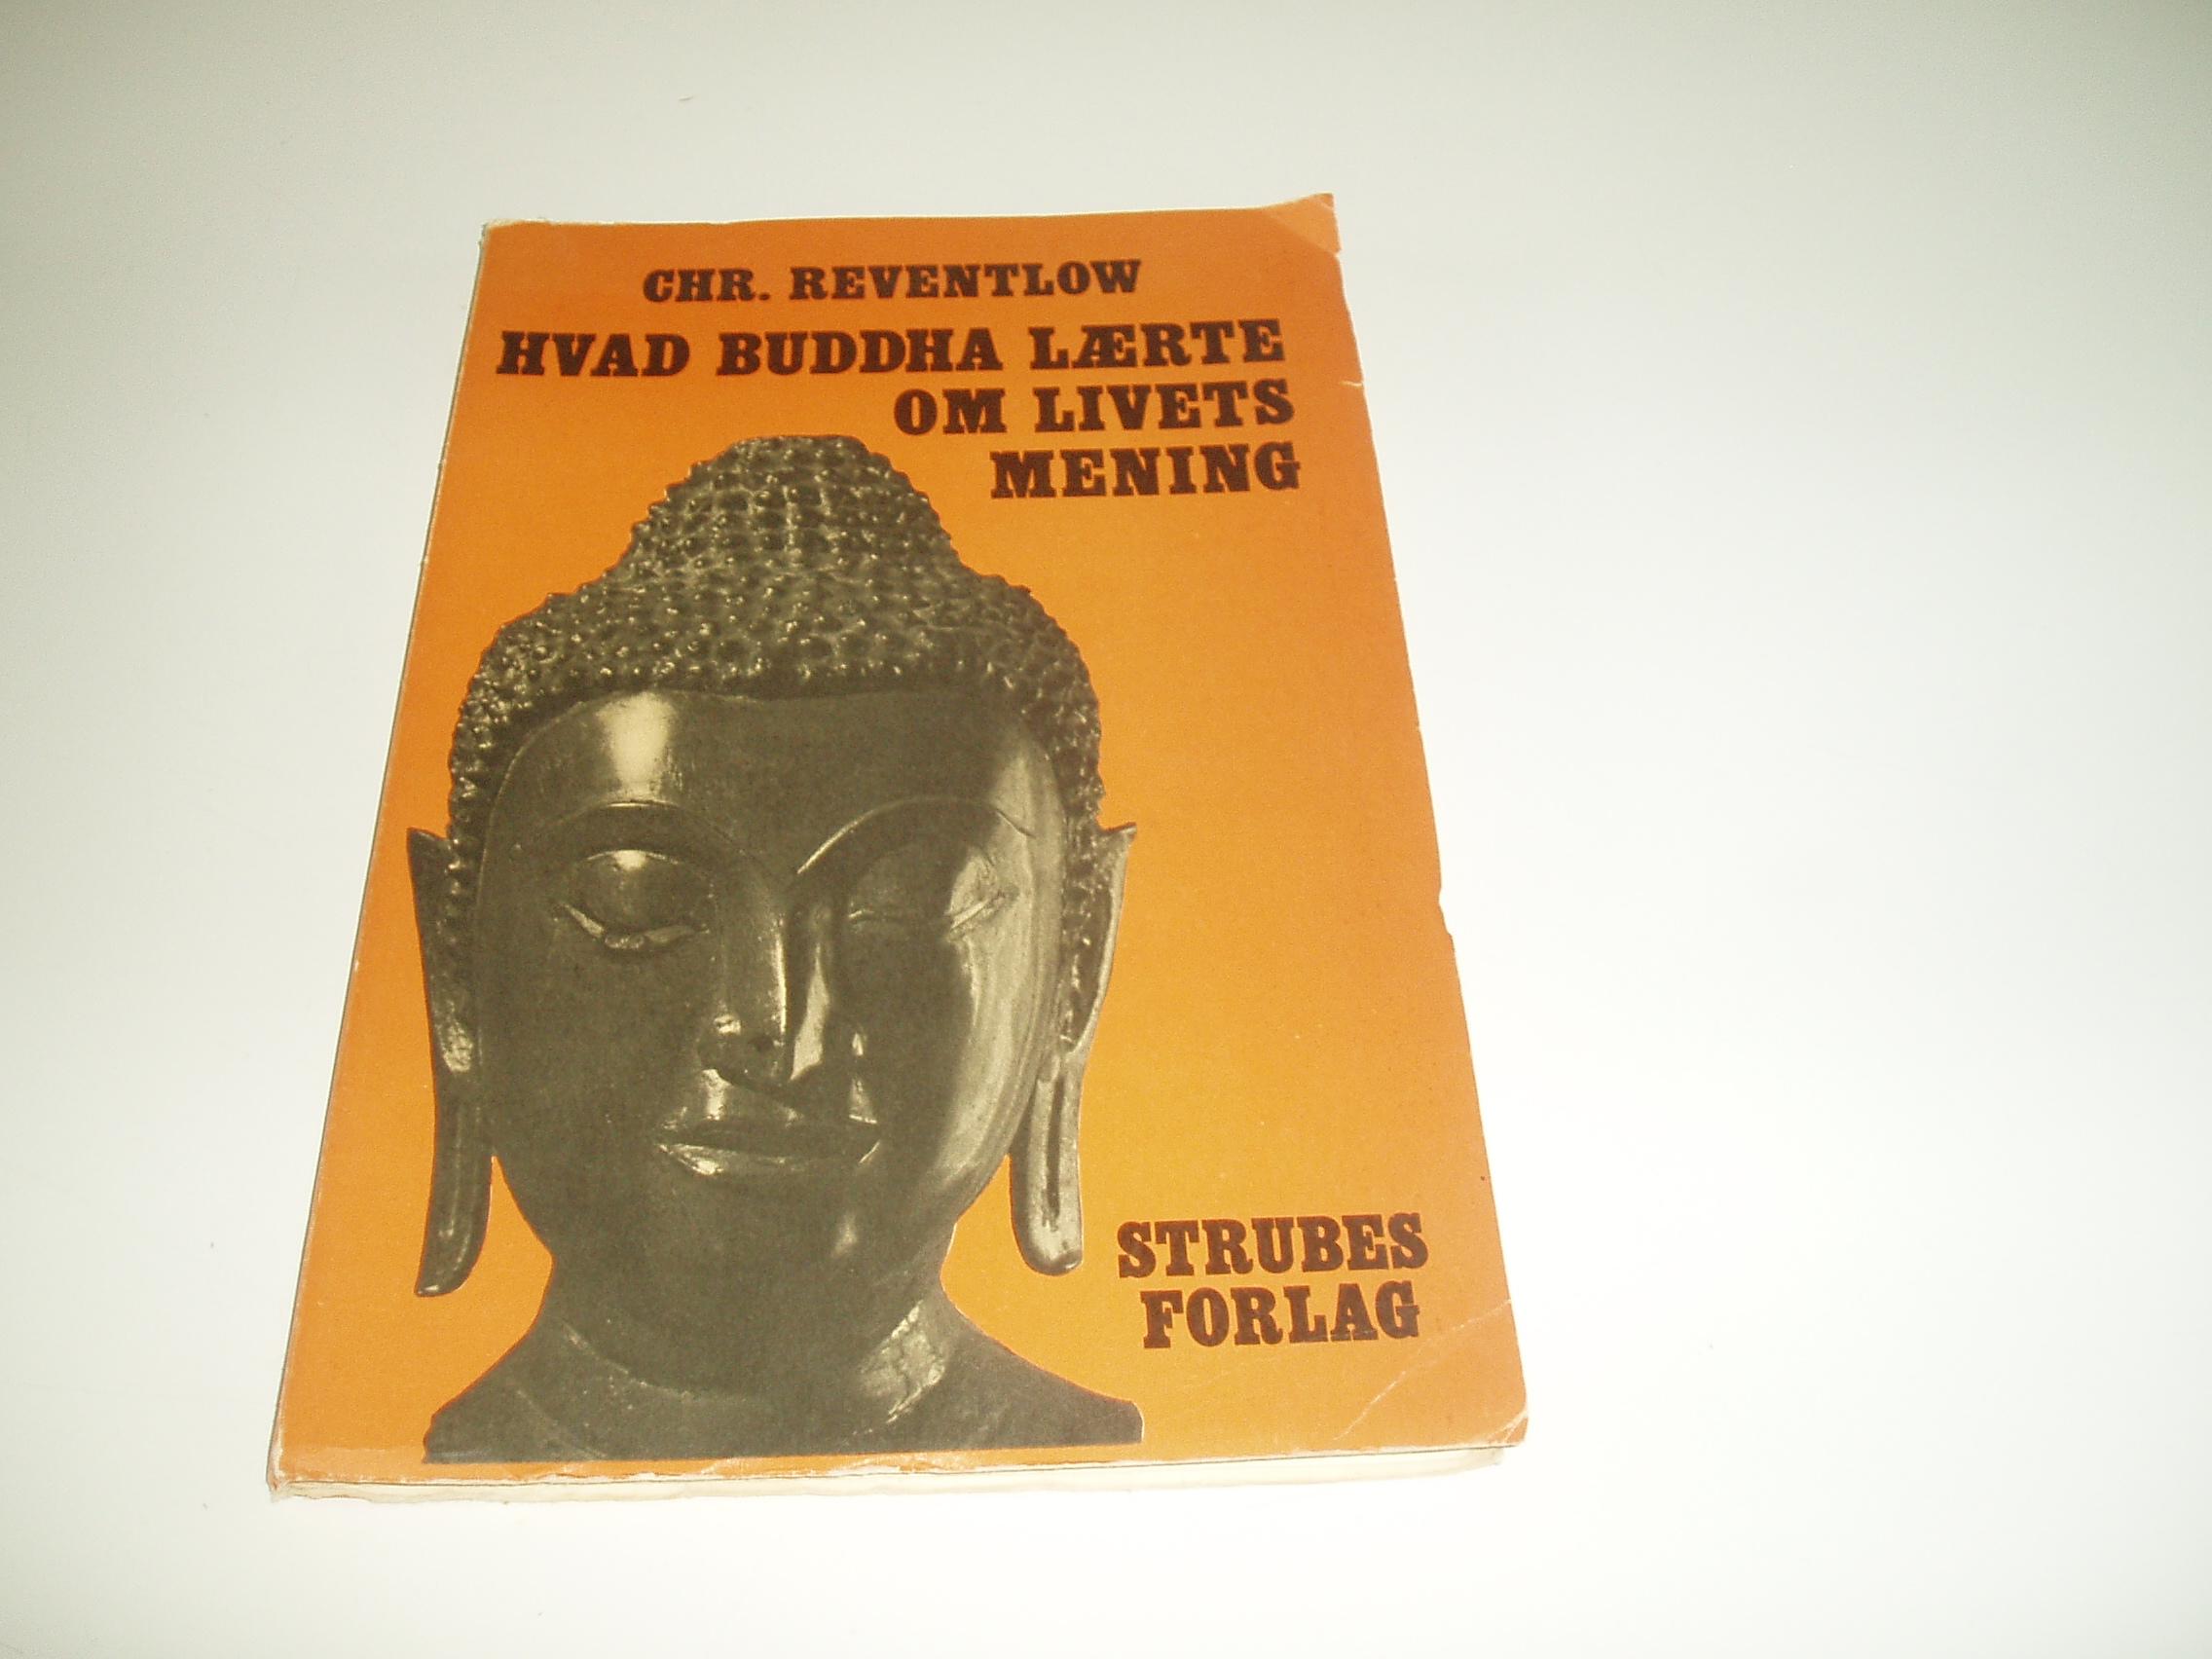 Hvad Buddha lærte om livets mening